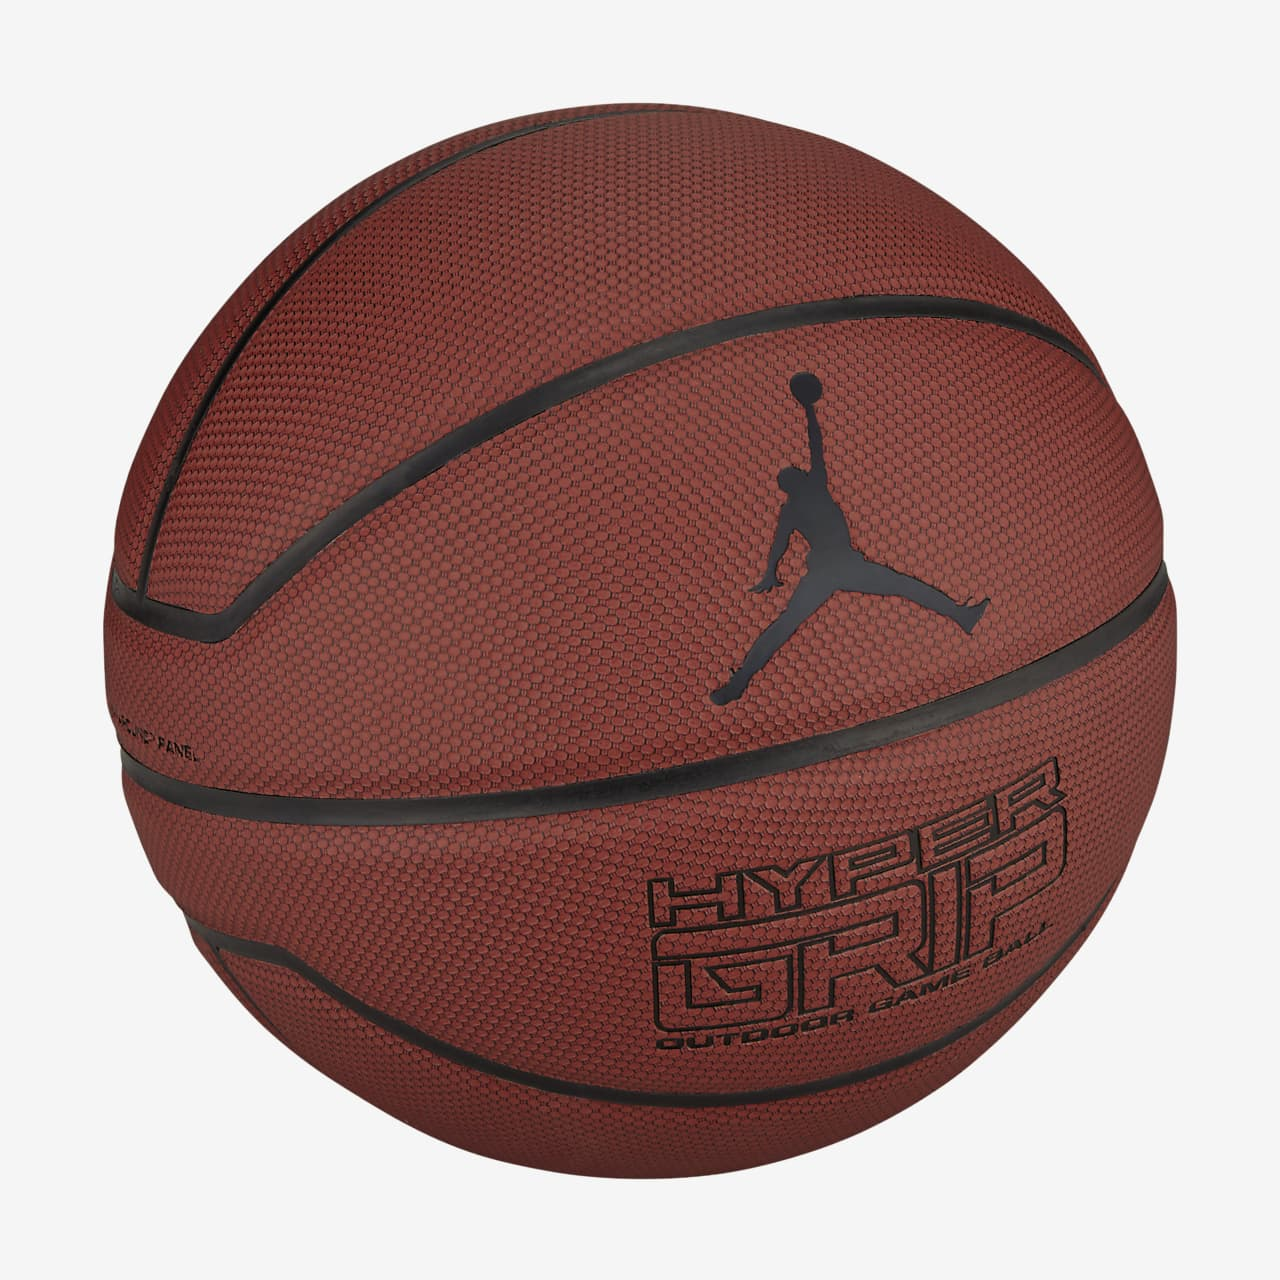 Jordan HyperGrip 4P Basketball